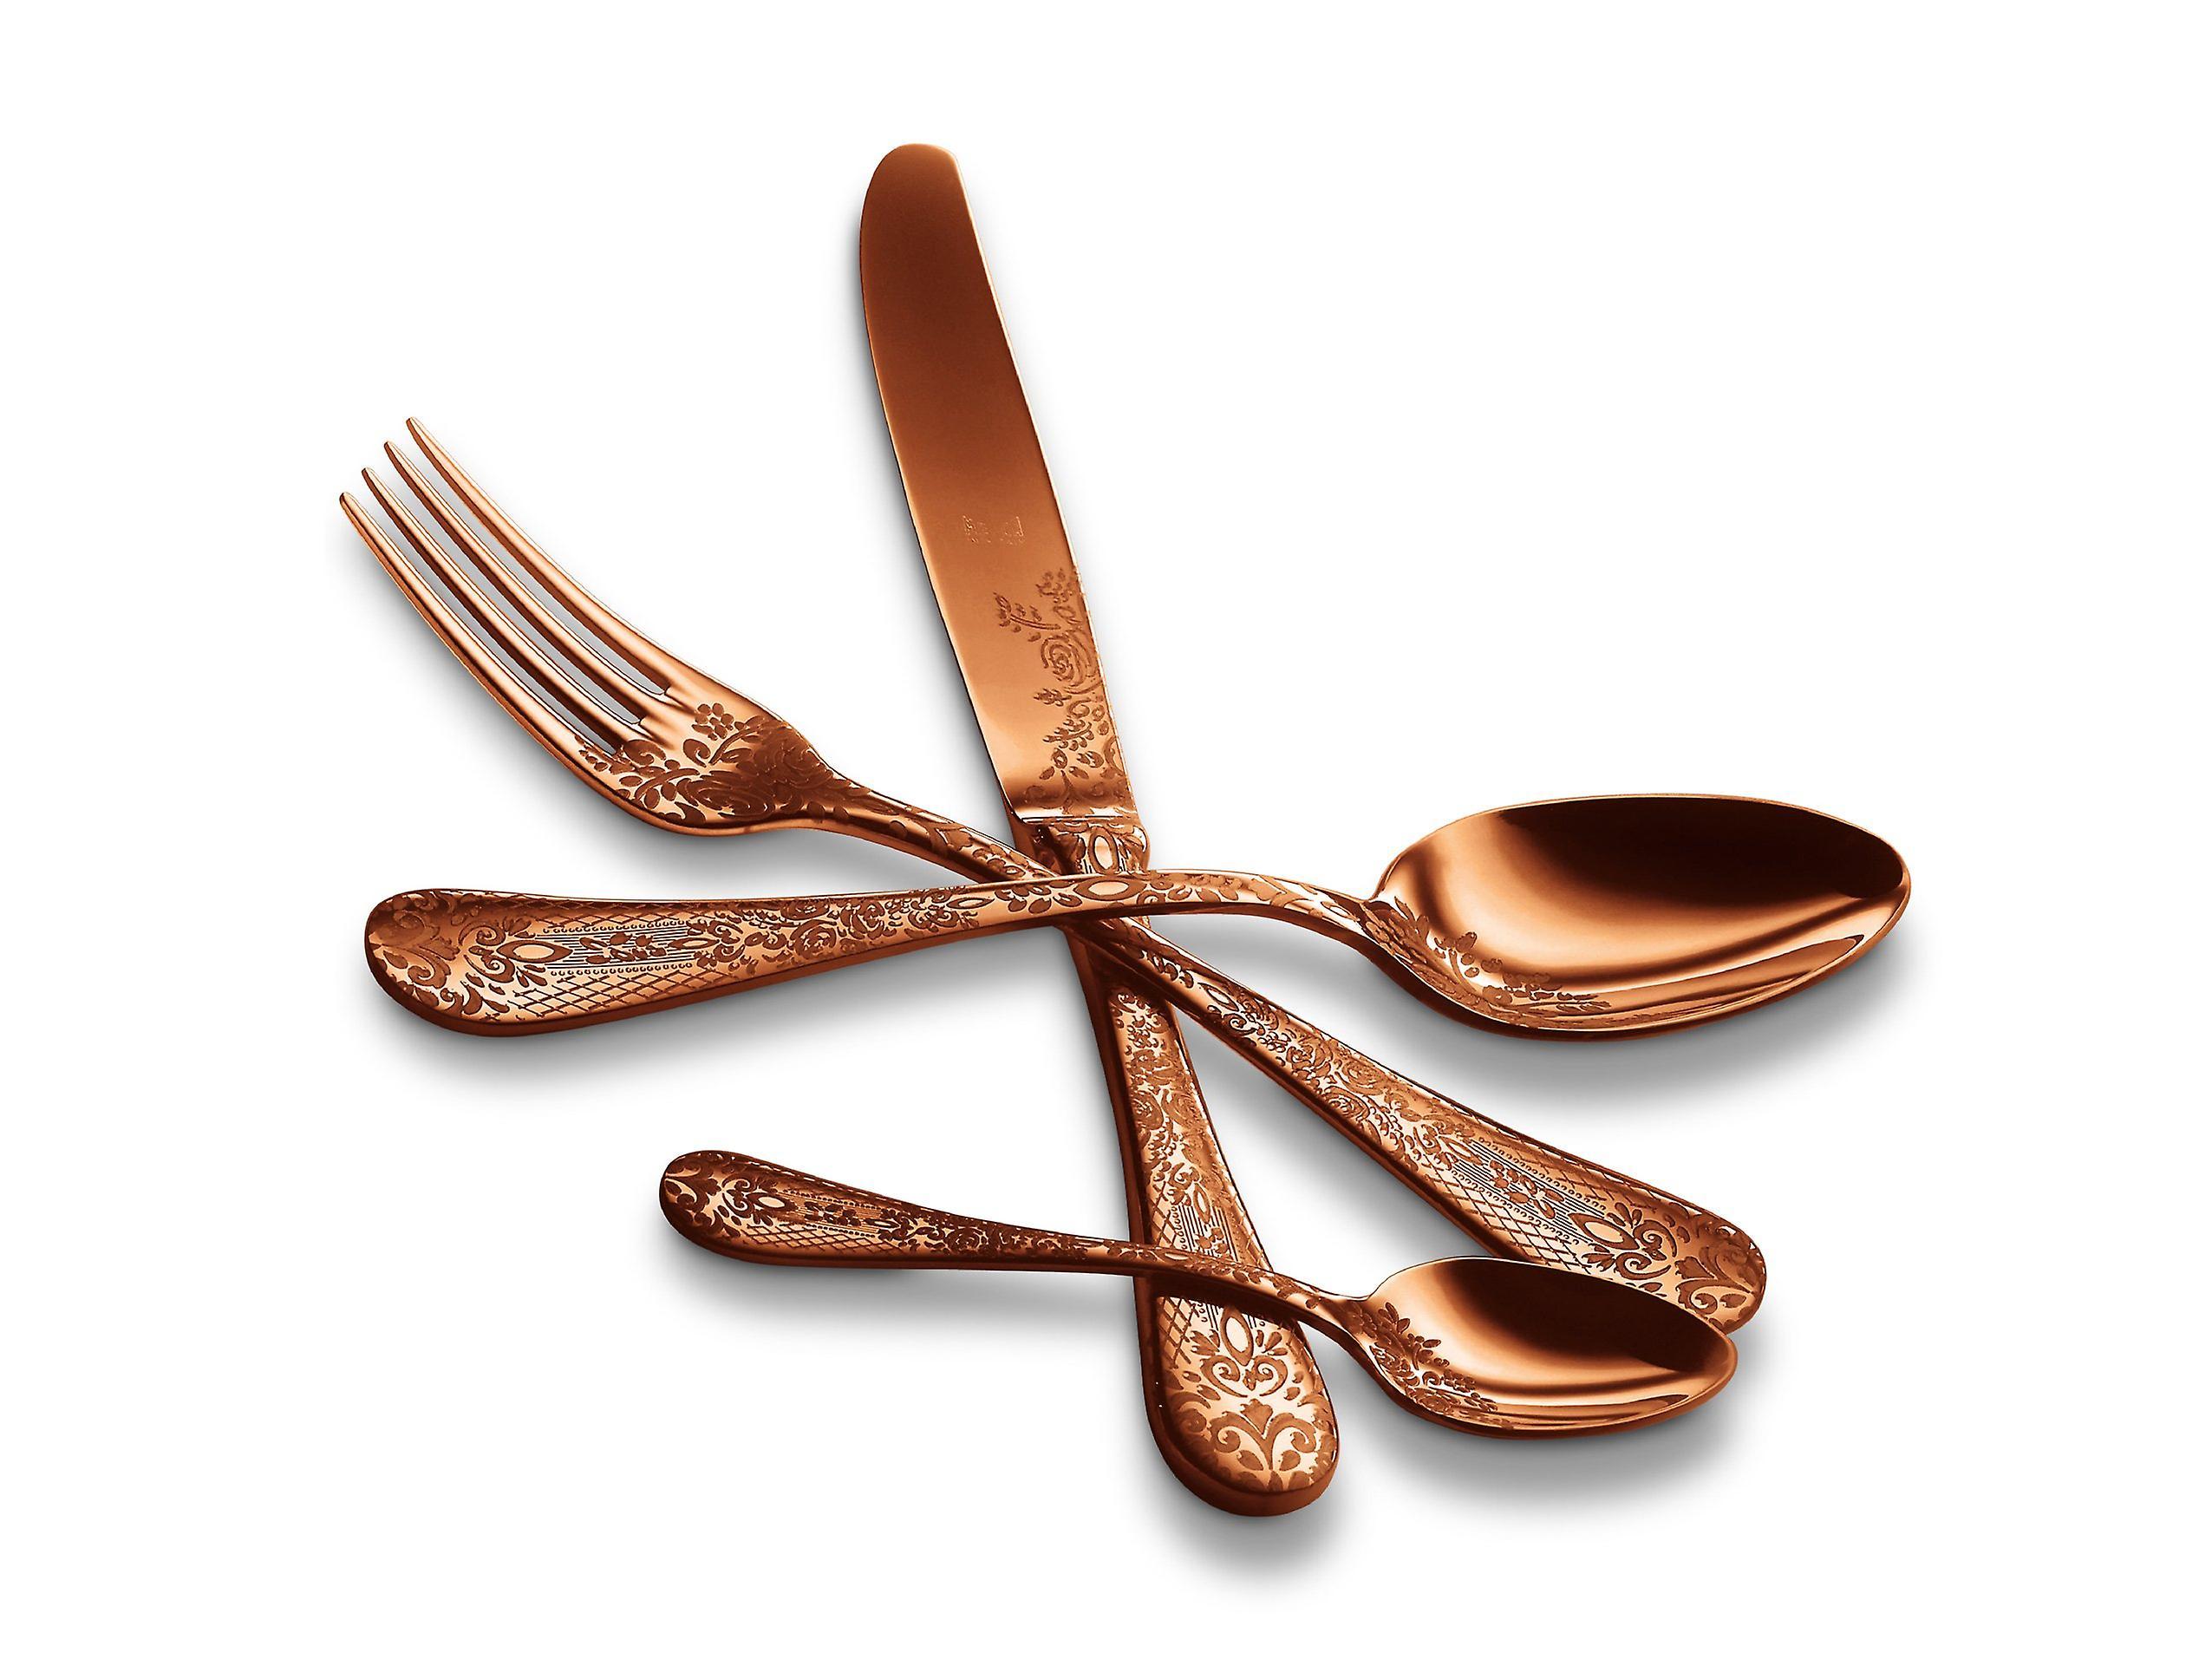 Mepra Casablanca Bronzo 5 pcs flatware set